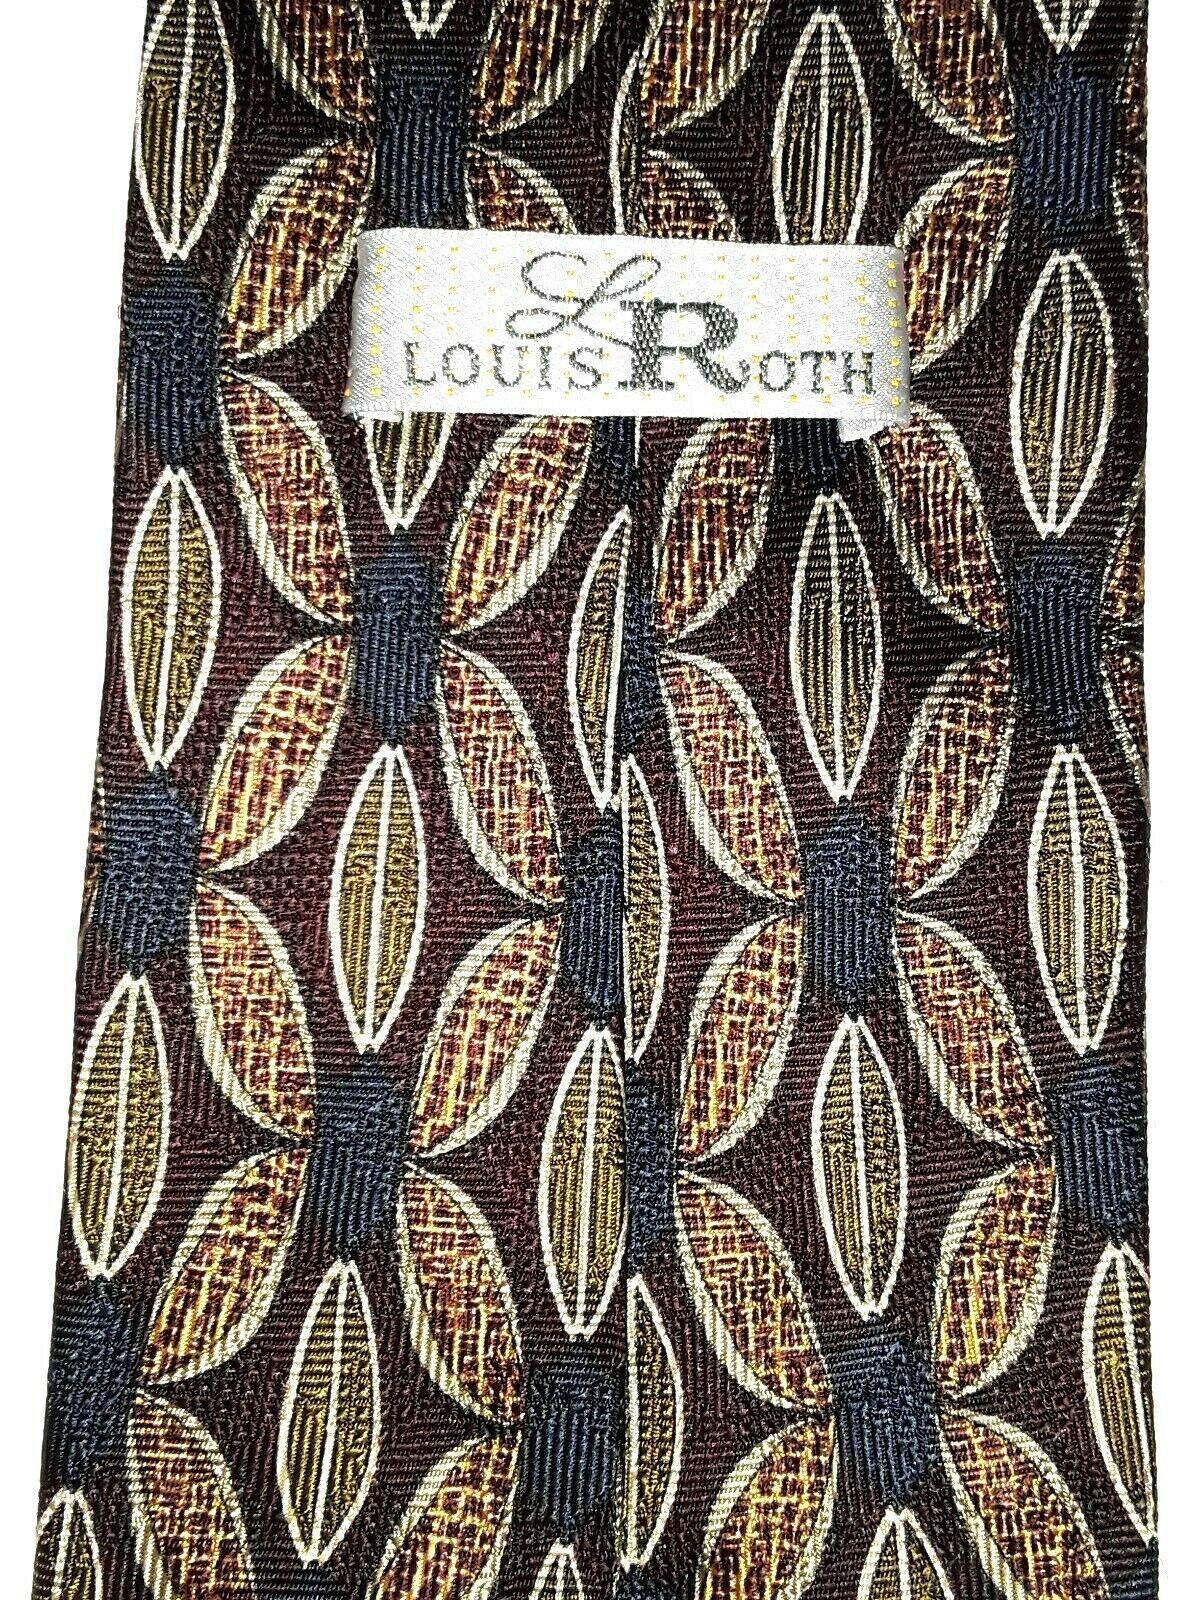 "Louis Roth Men's Tie Necktie 100% Silk Gold Black Burgundy Geometric 59"" x 4"" image 2"